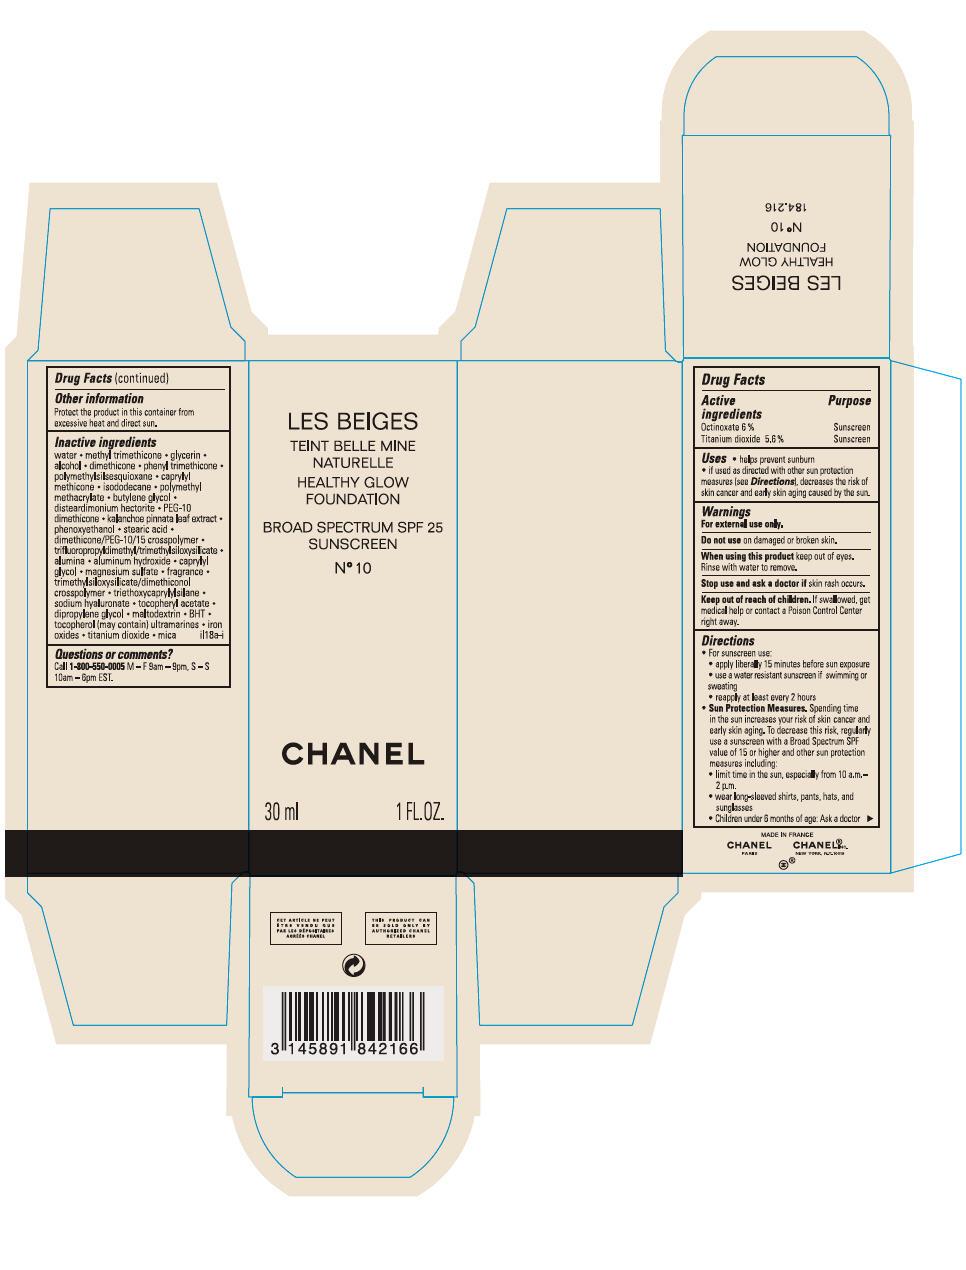 Principal Display Panel - 30 mL Bottle Carton - No 10